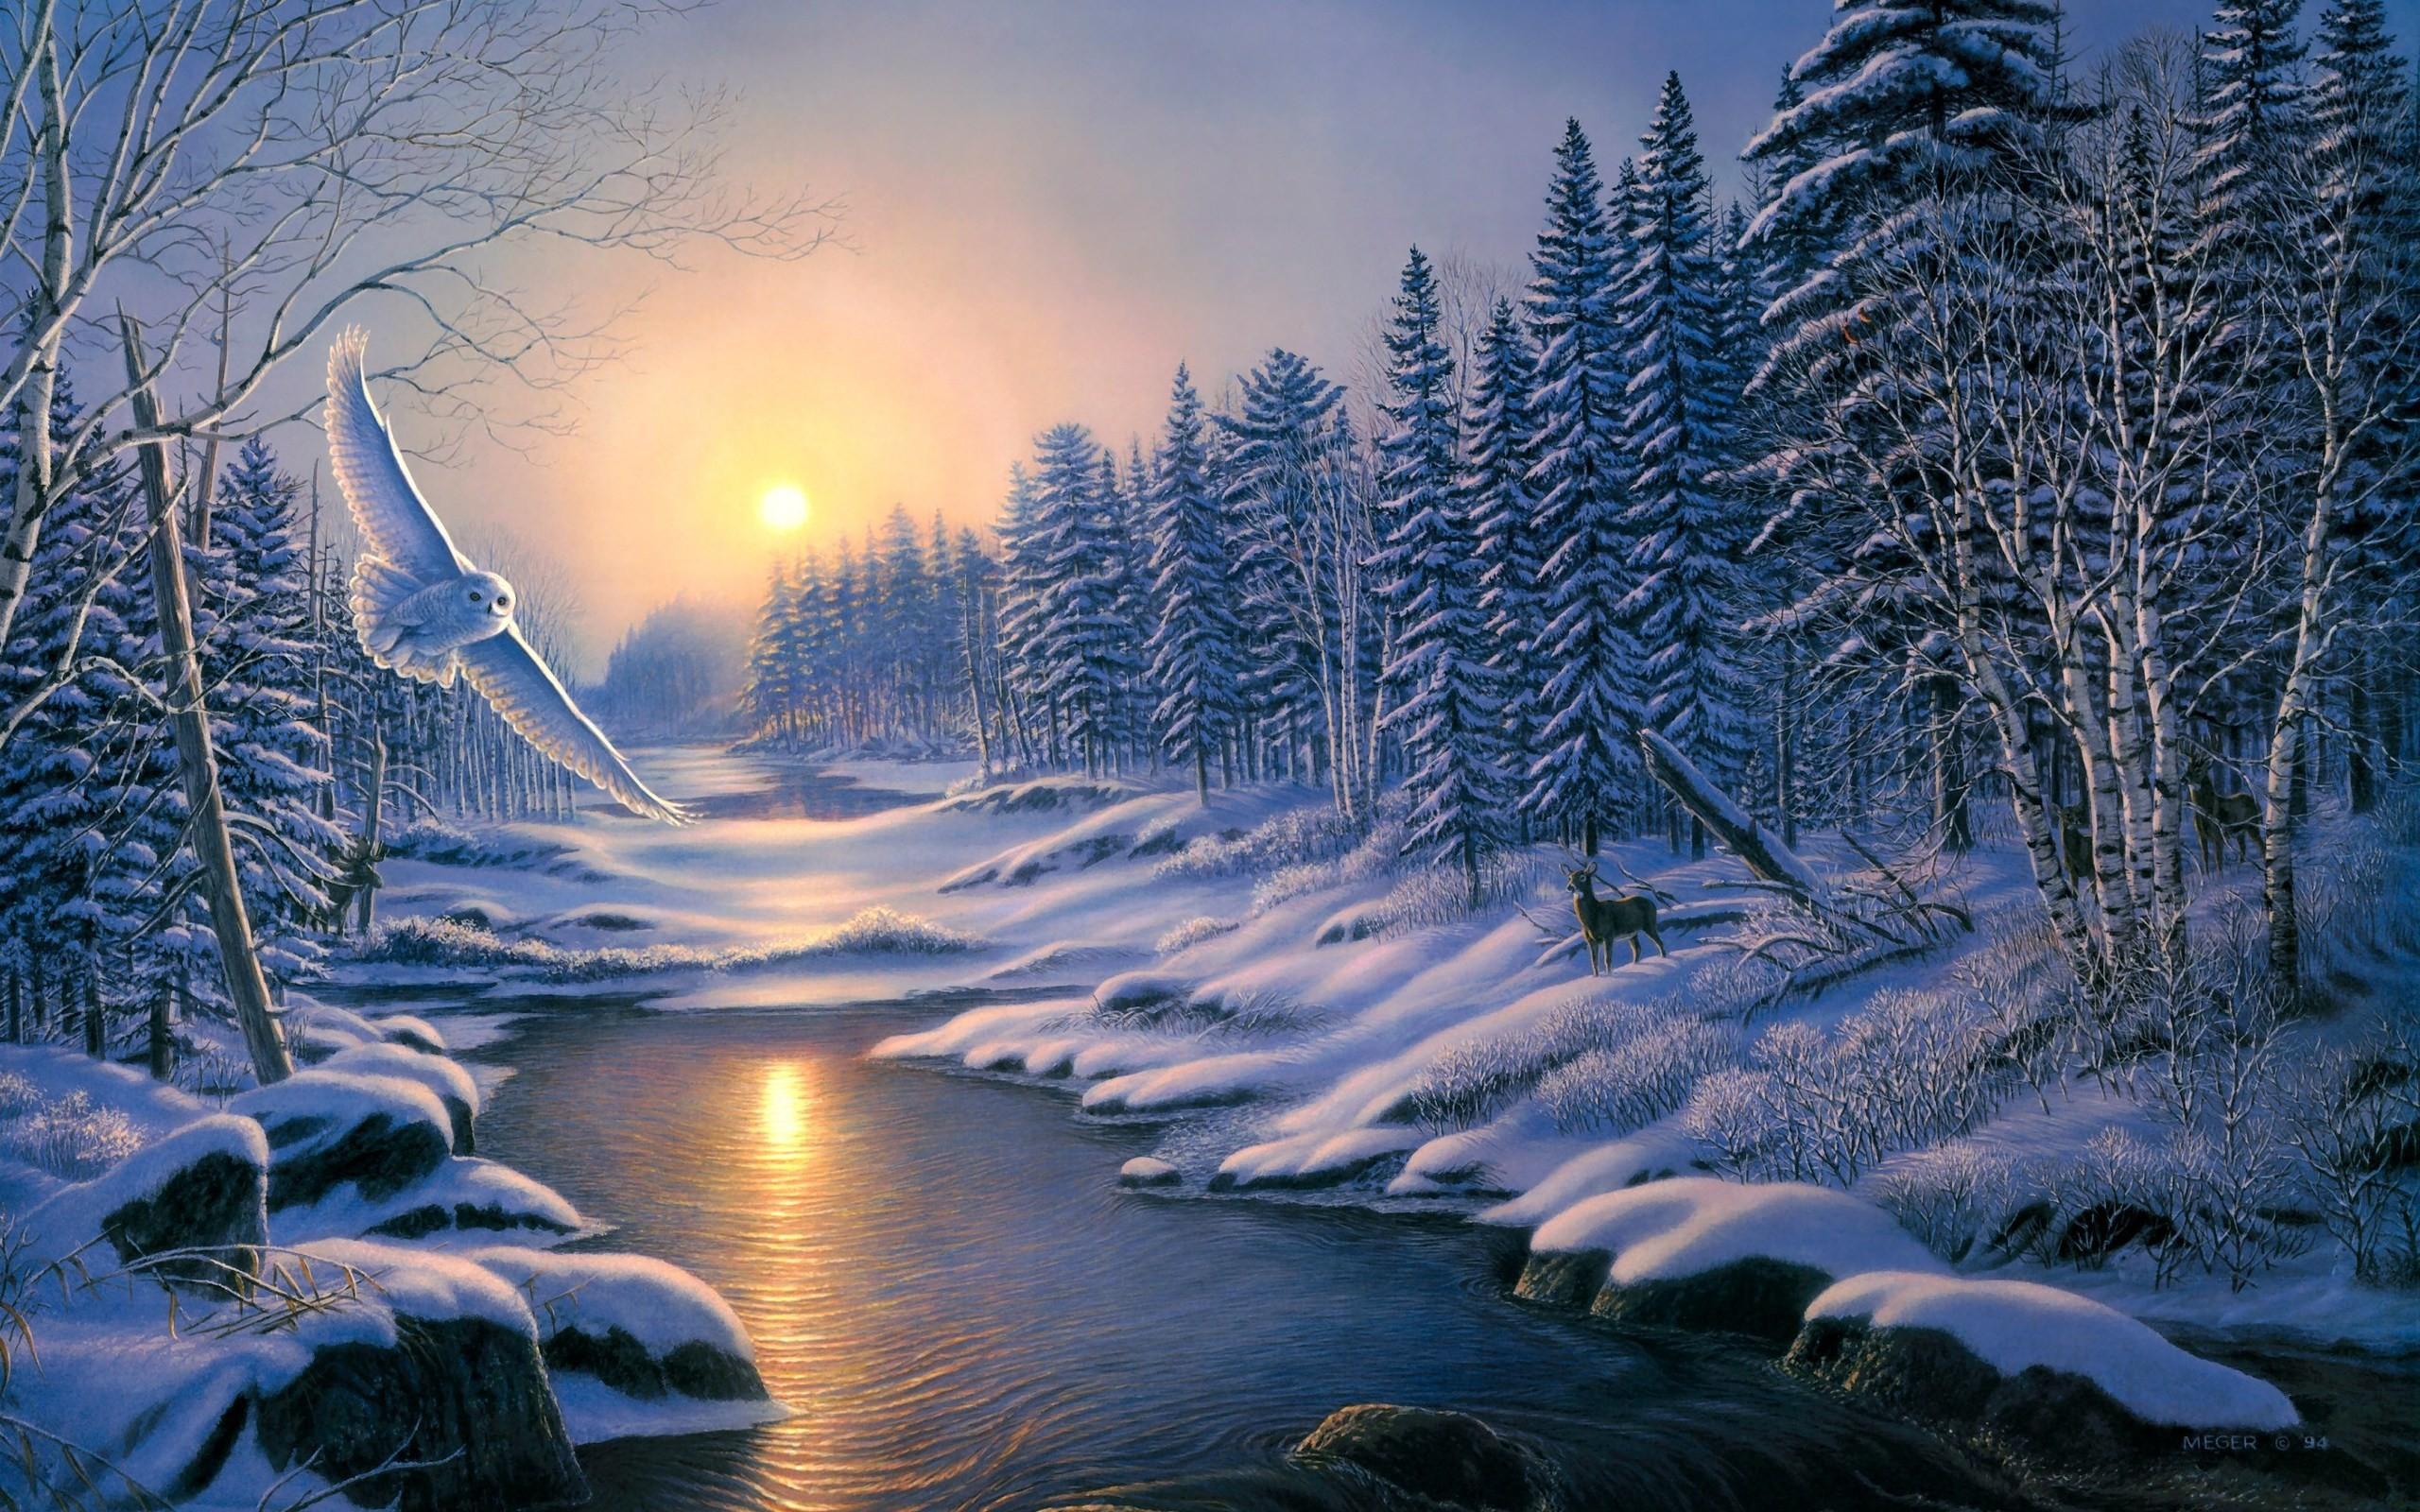 artistic winter Wallpaper Backgrounds